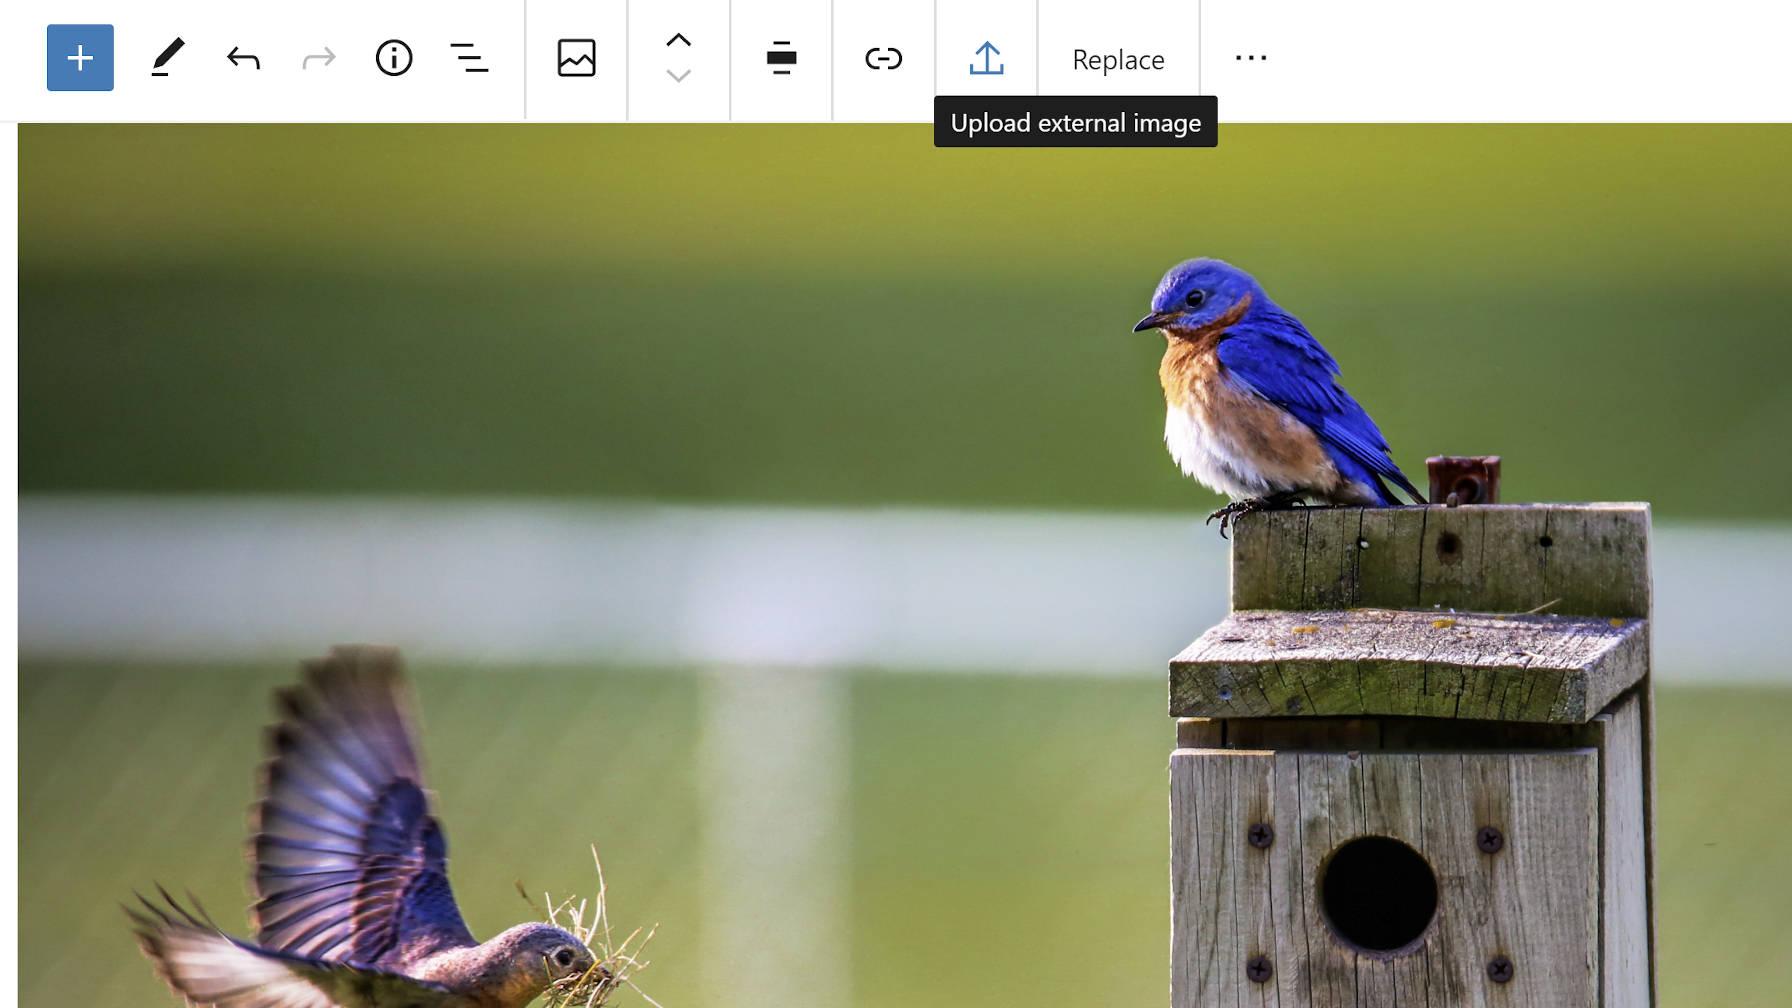 gutenberg-8-5添加了一个单库图像编辑允许图像从外部源上载,并改进了拖放功能Gutenberg 8.5添加了单个库图像编辑,允许从外部上载图像来源,并改善拖放